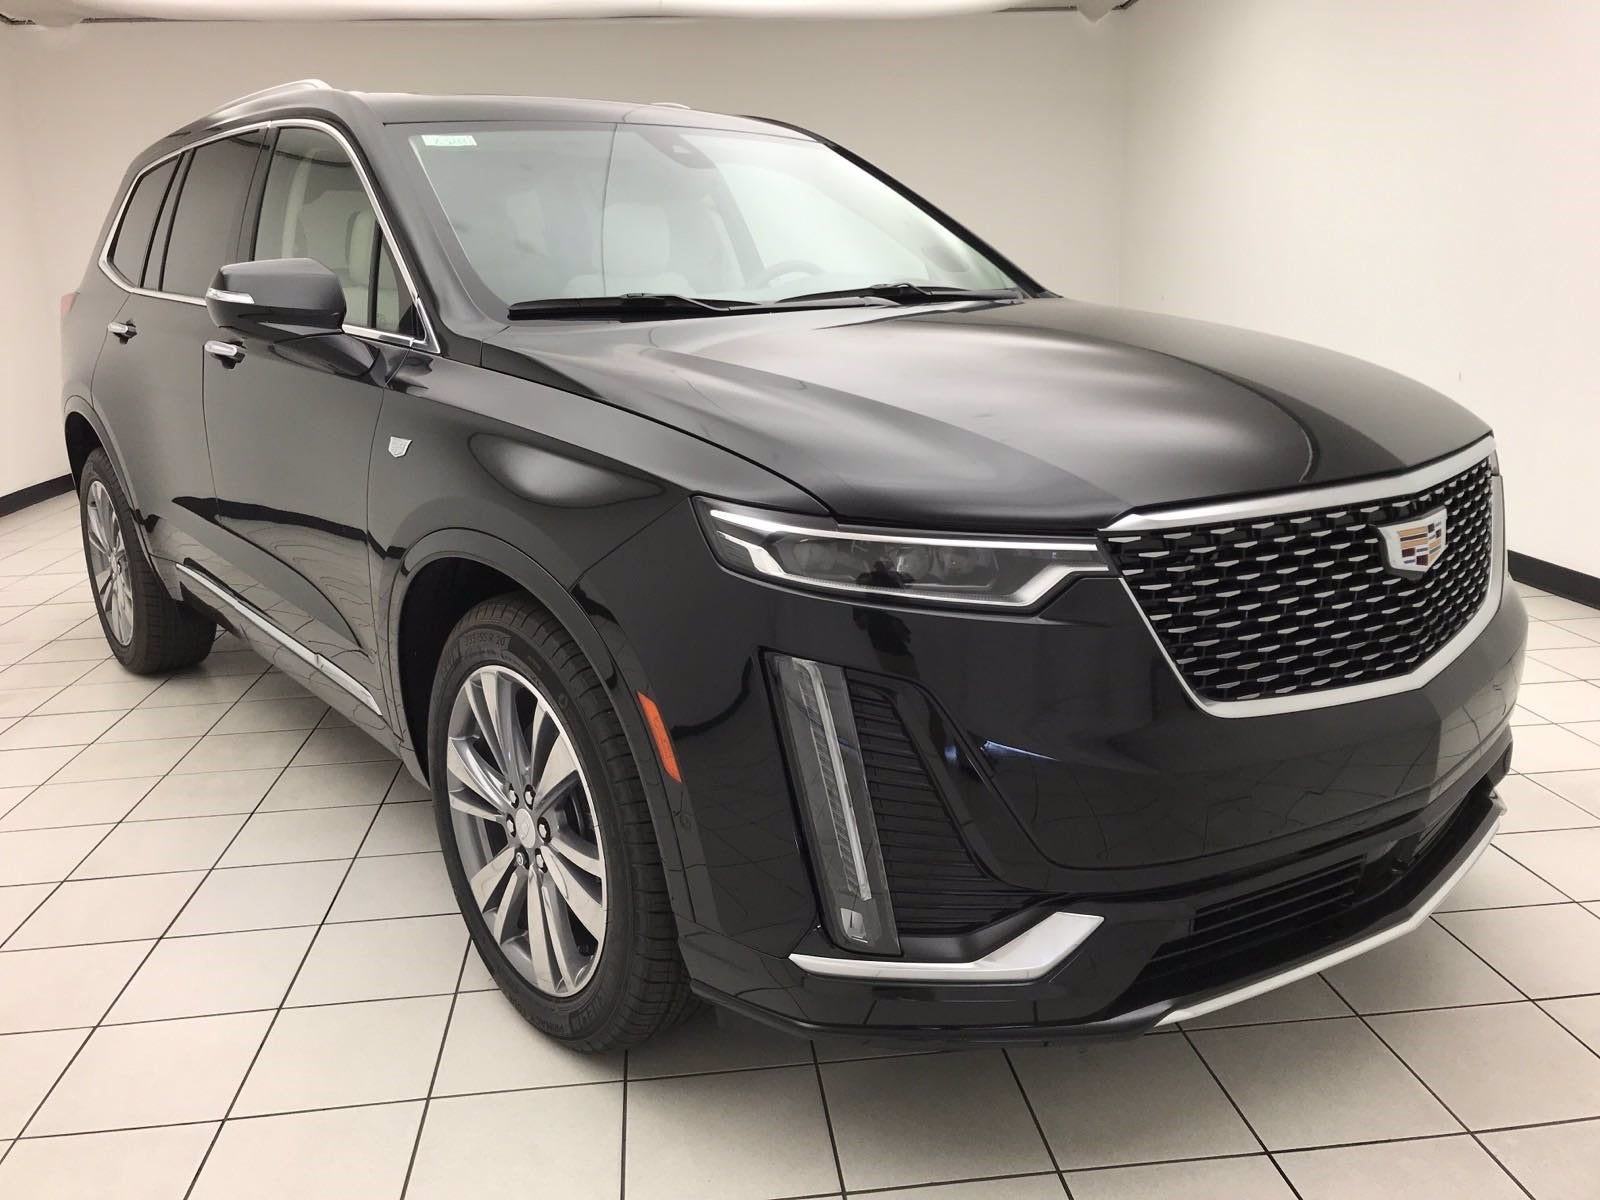 2021 Cadillac XT6 Sheboygan WI